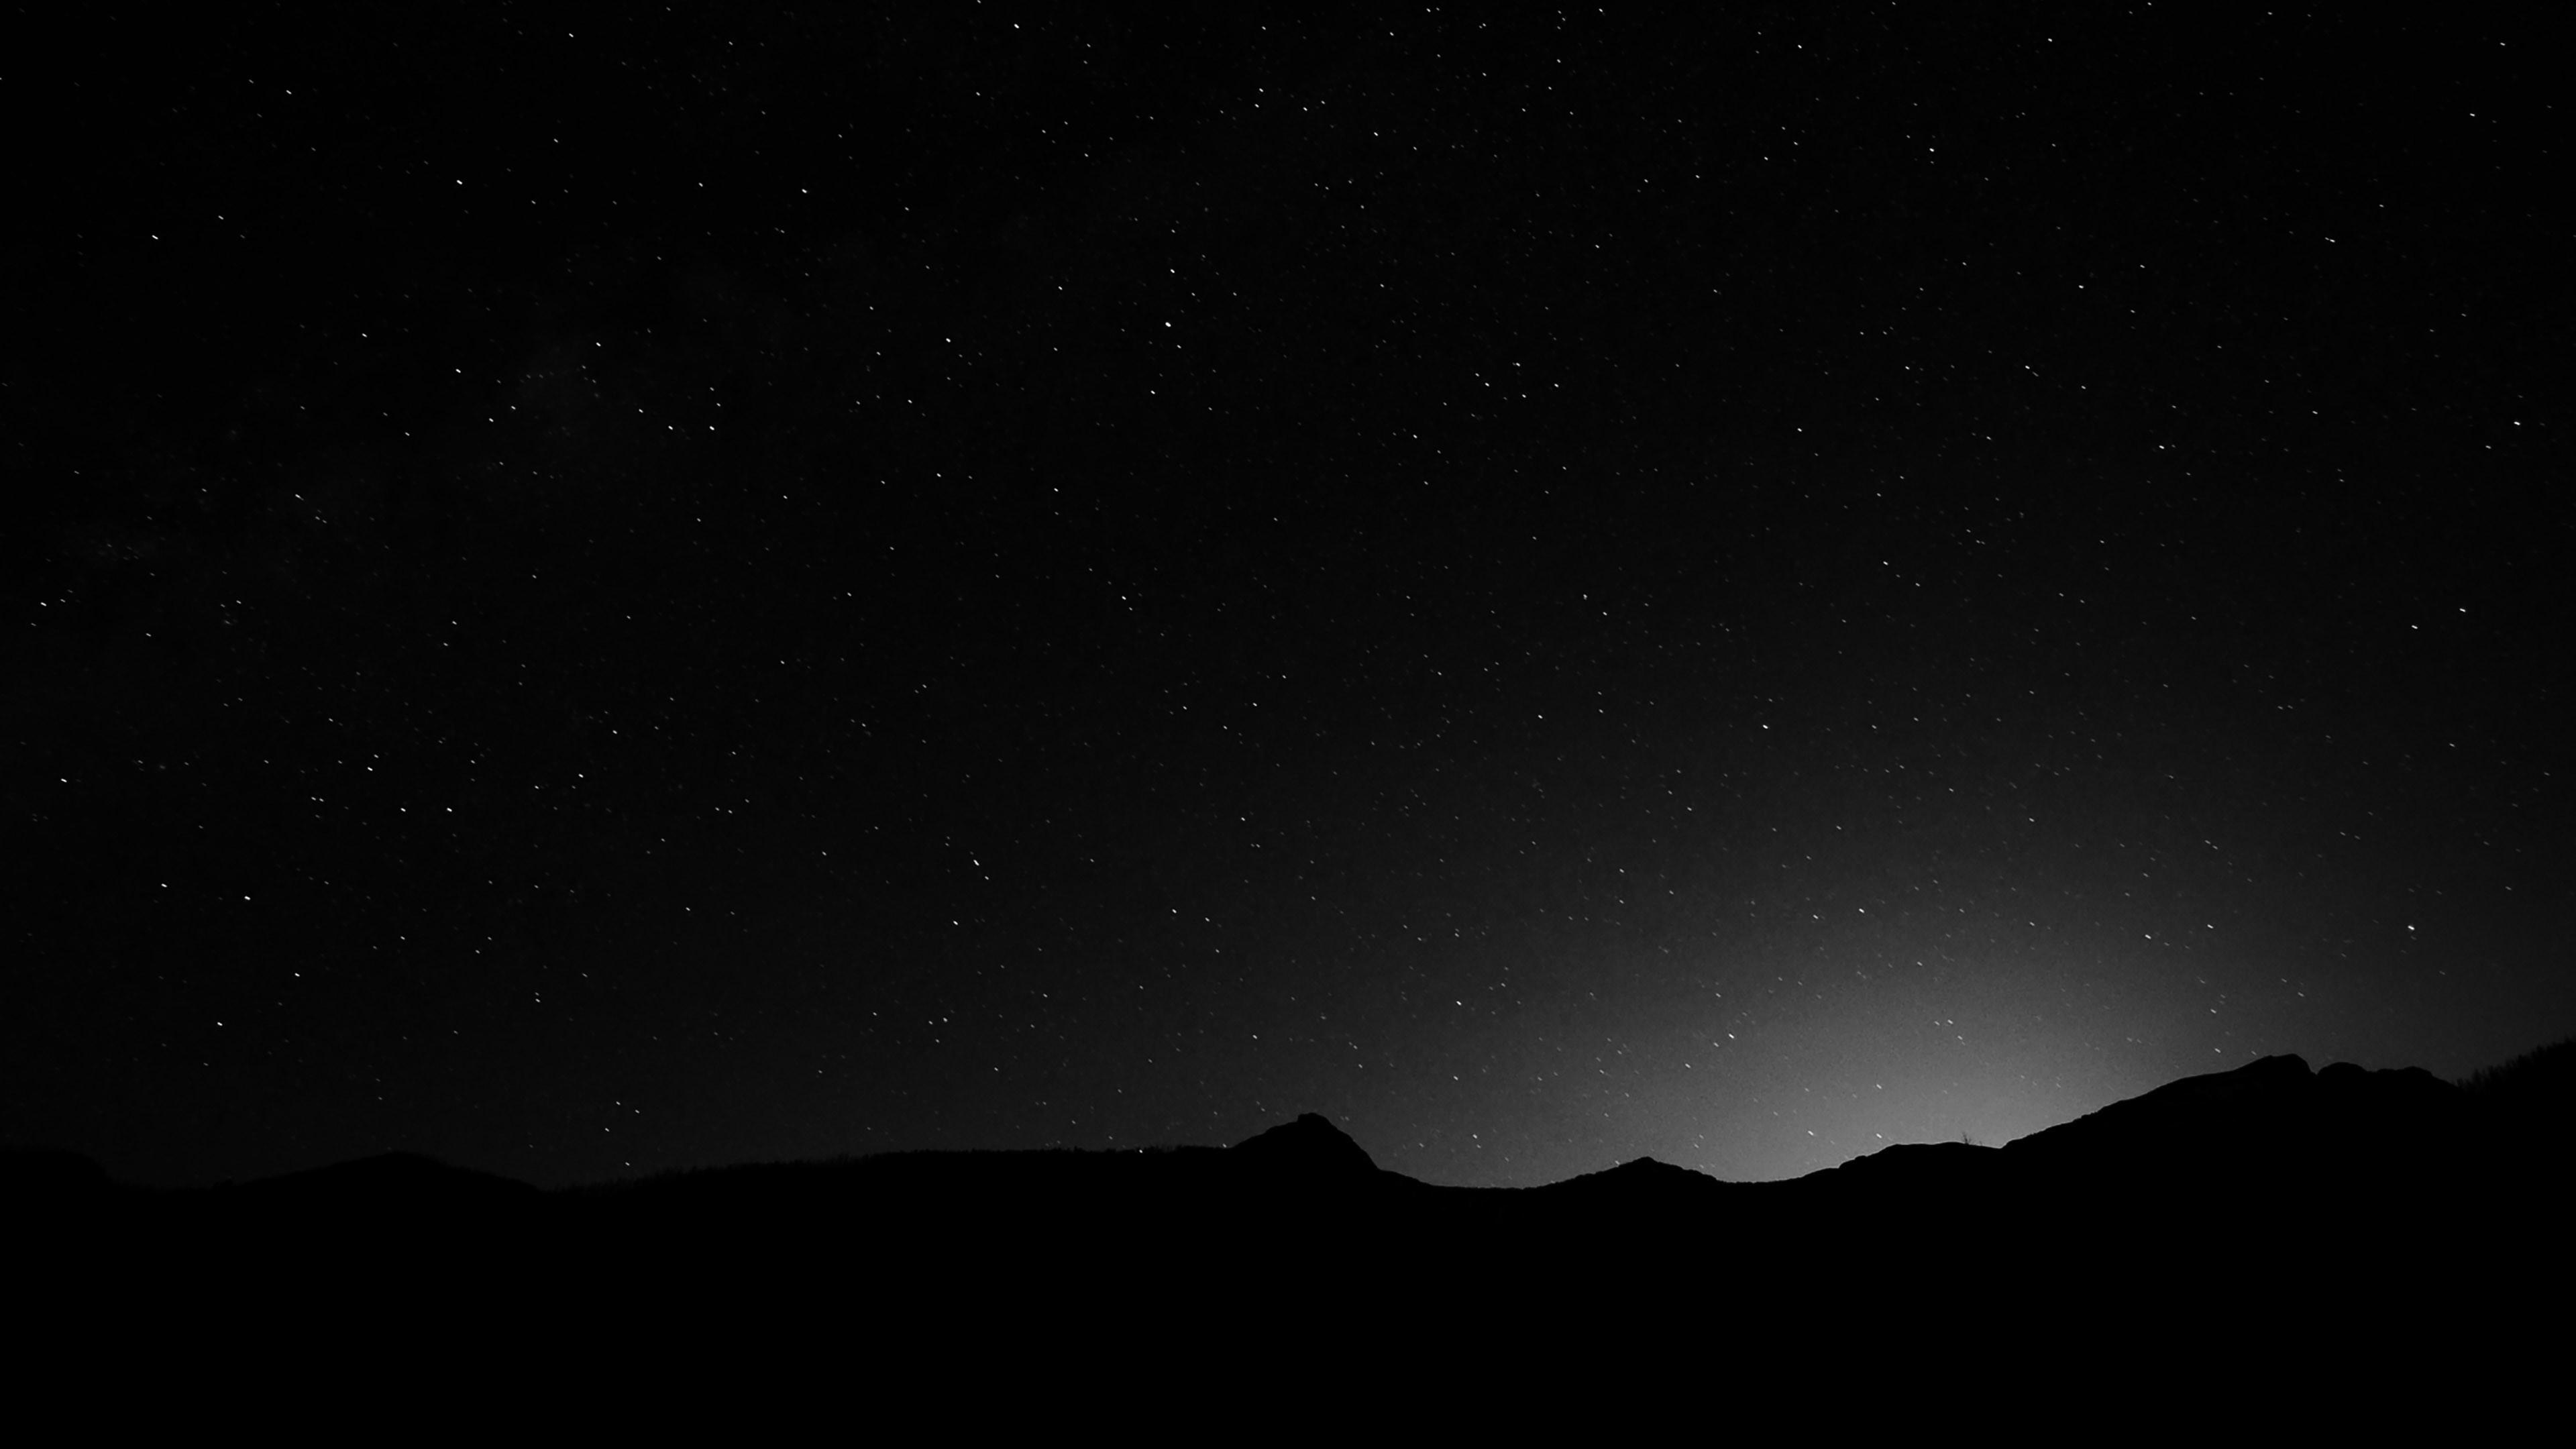 Night Sky over the Mountains Black & White 4K Wallpaper